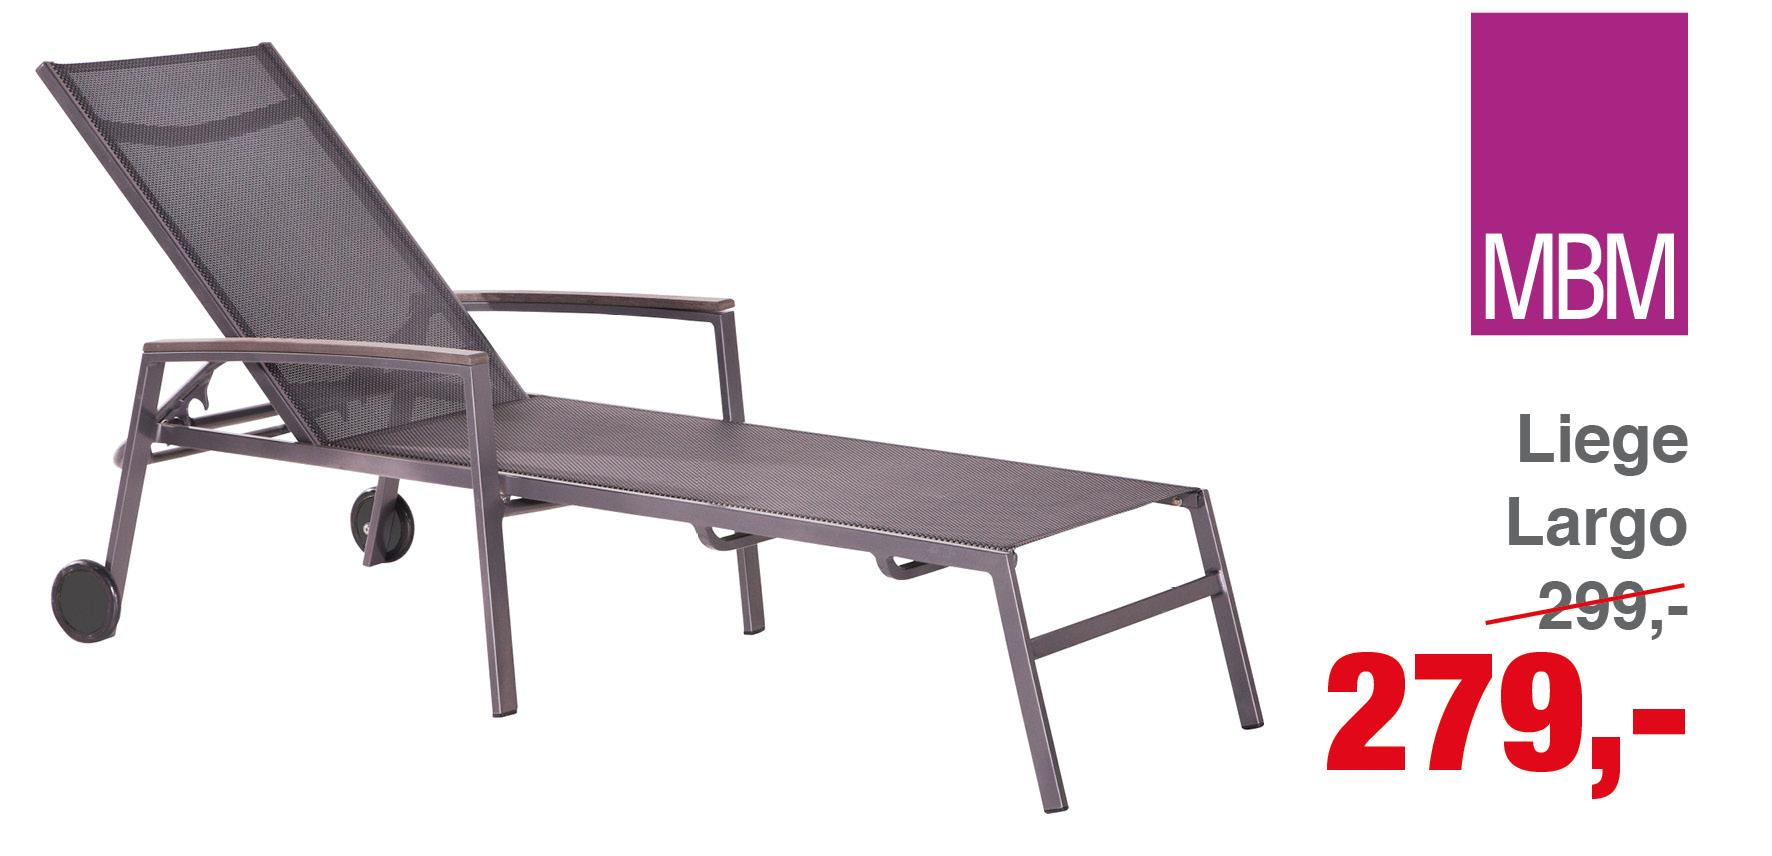 liege largo mbm gartenm bel lagerverkauf. Black Bedroom Furniture Sets. Home Design Ideas